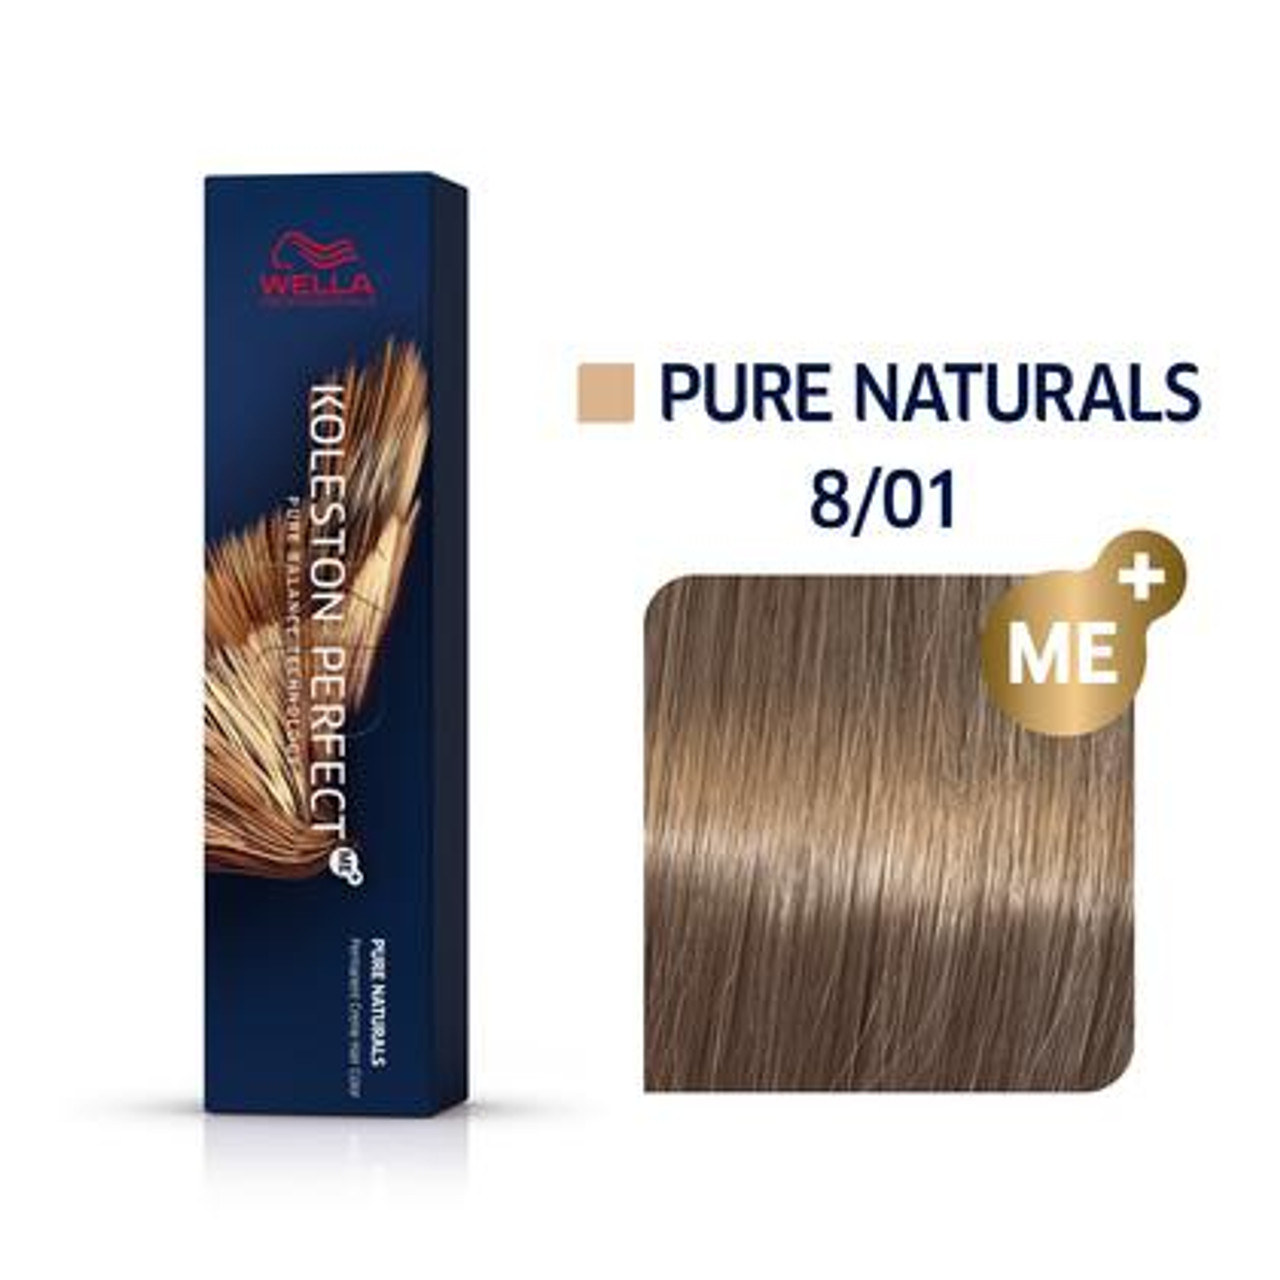 Wella Koleston Perfect Permanent Creme Hair Color - 8/01 Pure Naturals 2 Oz.